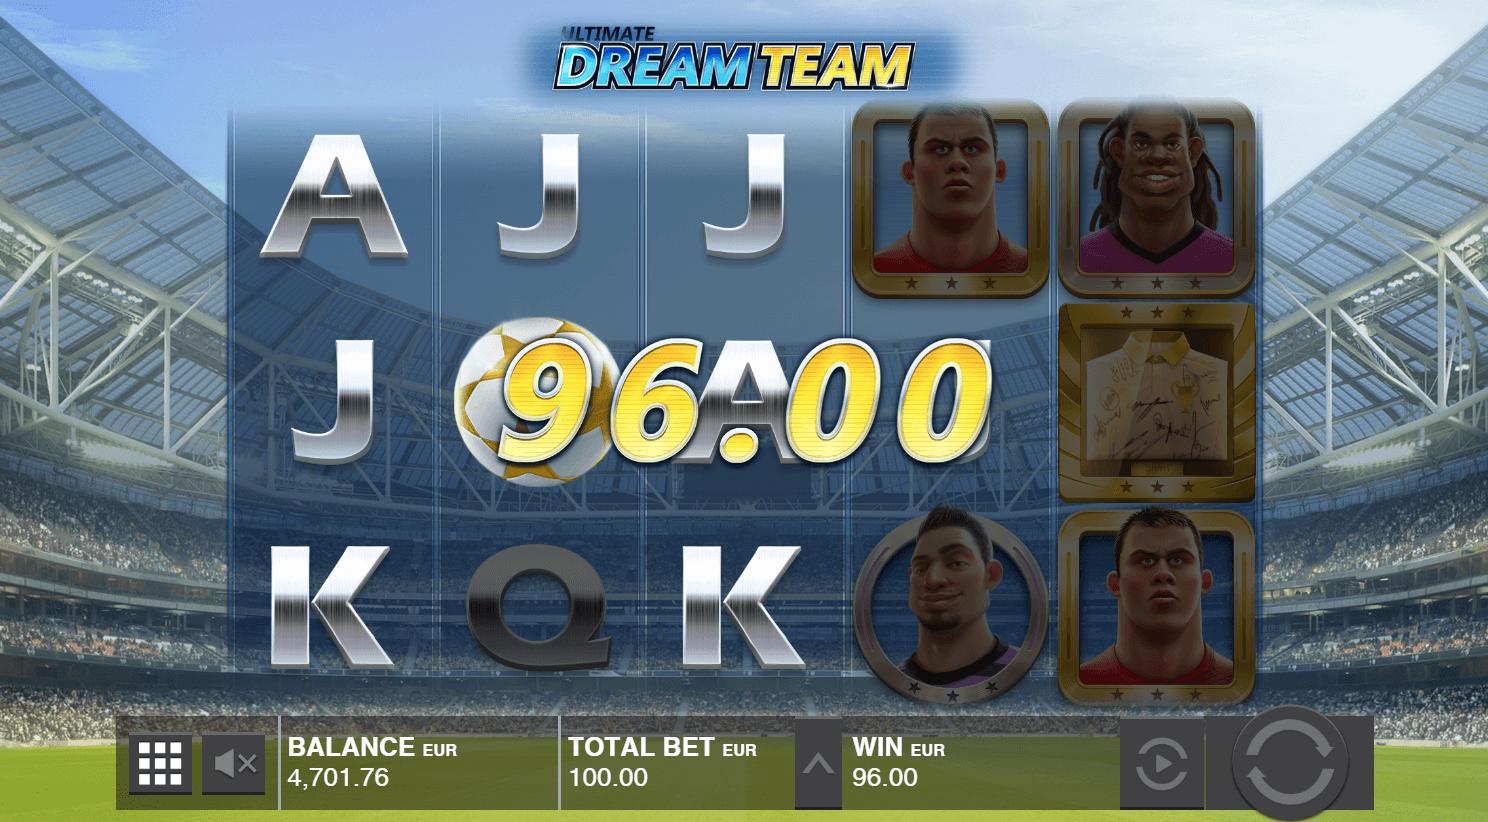 Ultimate Dreamteam